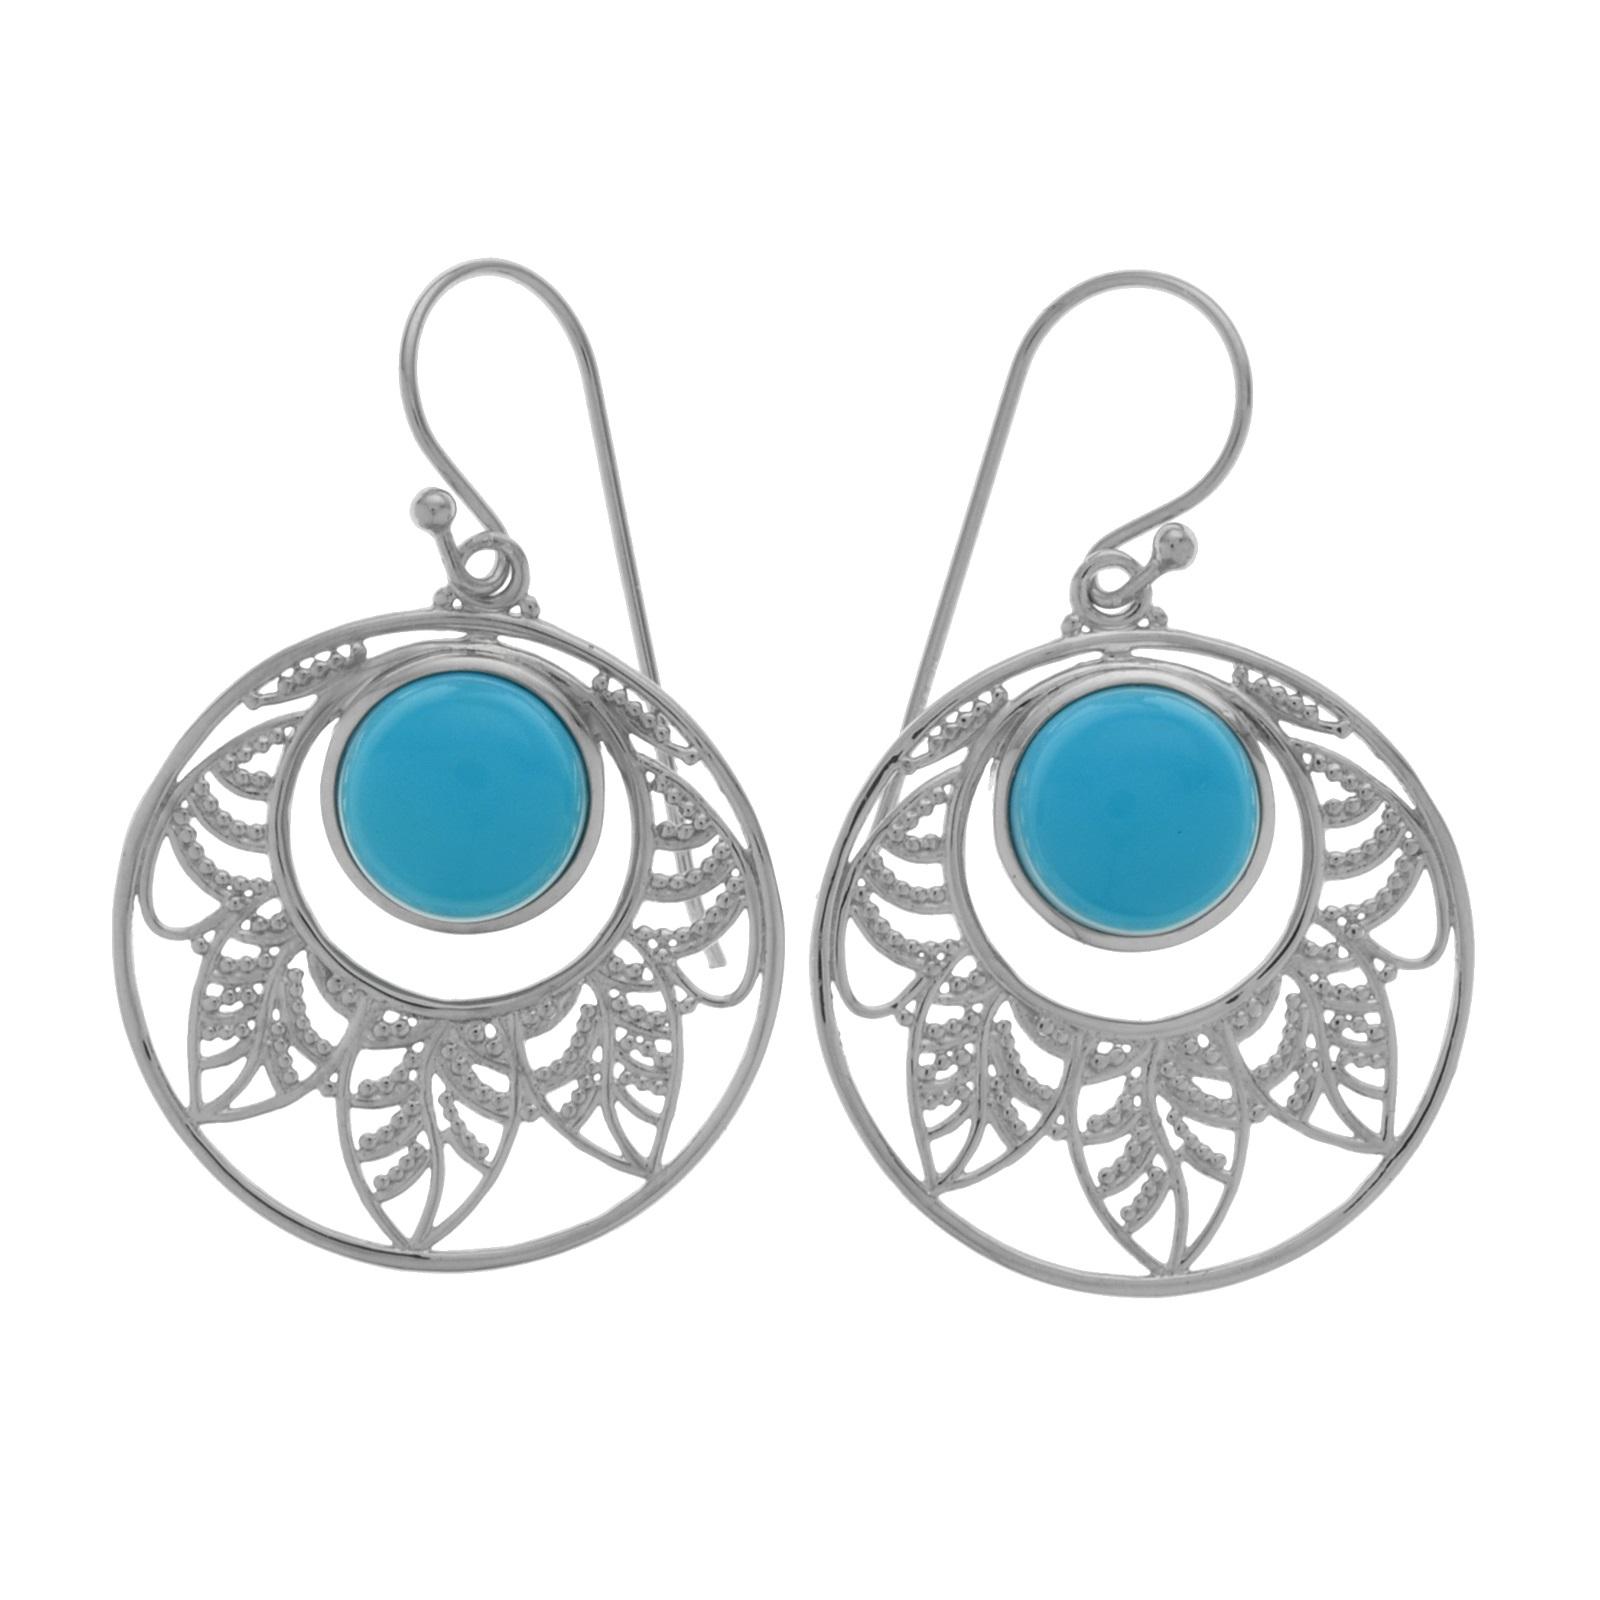 1600x1600 Sterling Silver 1.5 Sonora Beauty Turquoise Leaf Drop Earrings